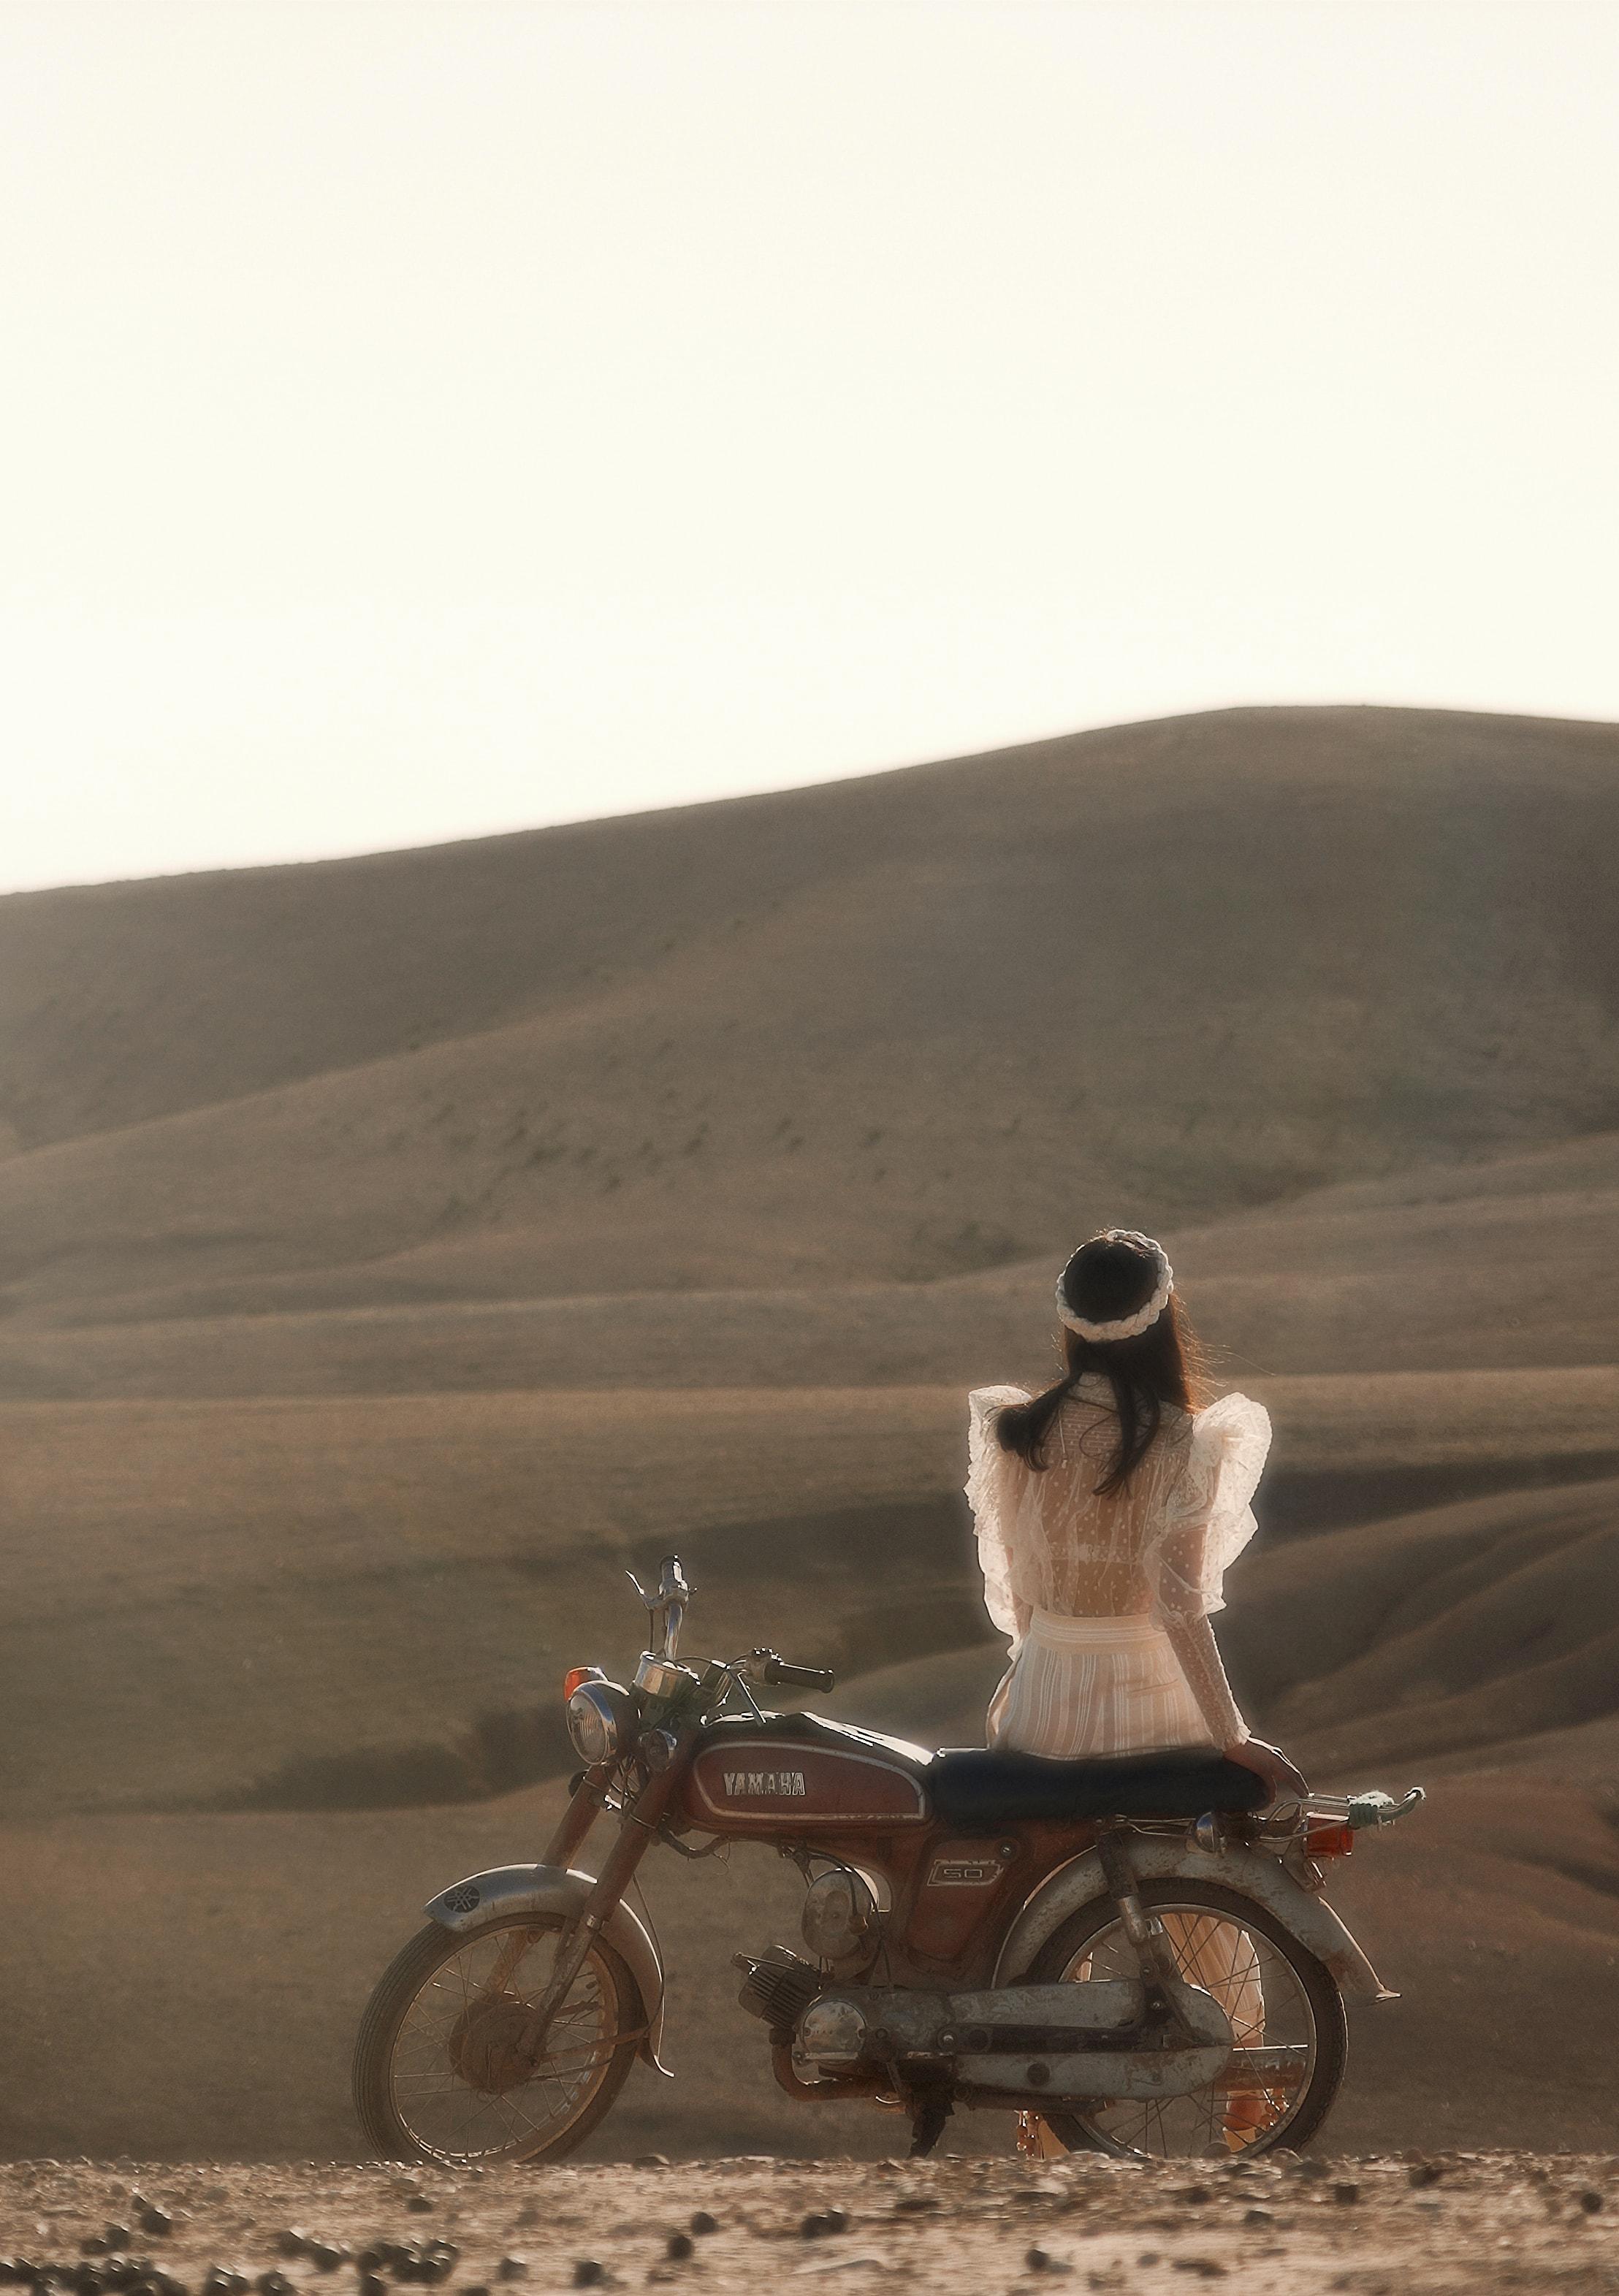 'Oasis Desire' (taken in Morocco during the Philosophy di Lorenzo Serafini SS 2019 campaign). Model:    @quusje   ,    @elite_amsterdam   . Make up: Francesca Basilio. Styling: Amelianna Loiacono. Production: Matteo Ciboldi. Photo: Alexandra Mascia